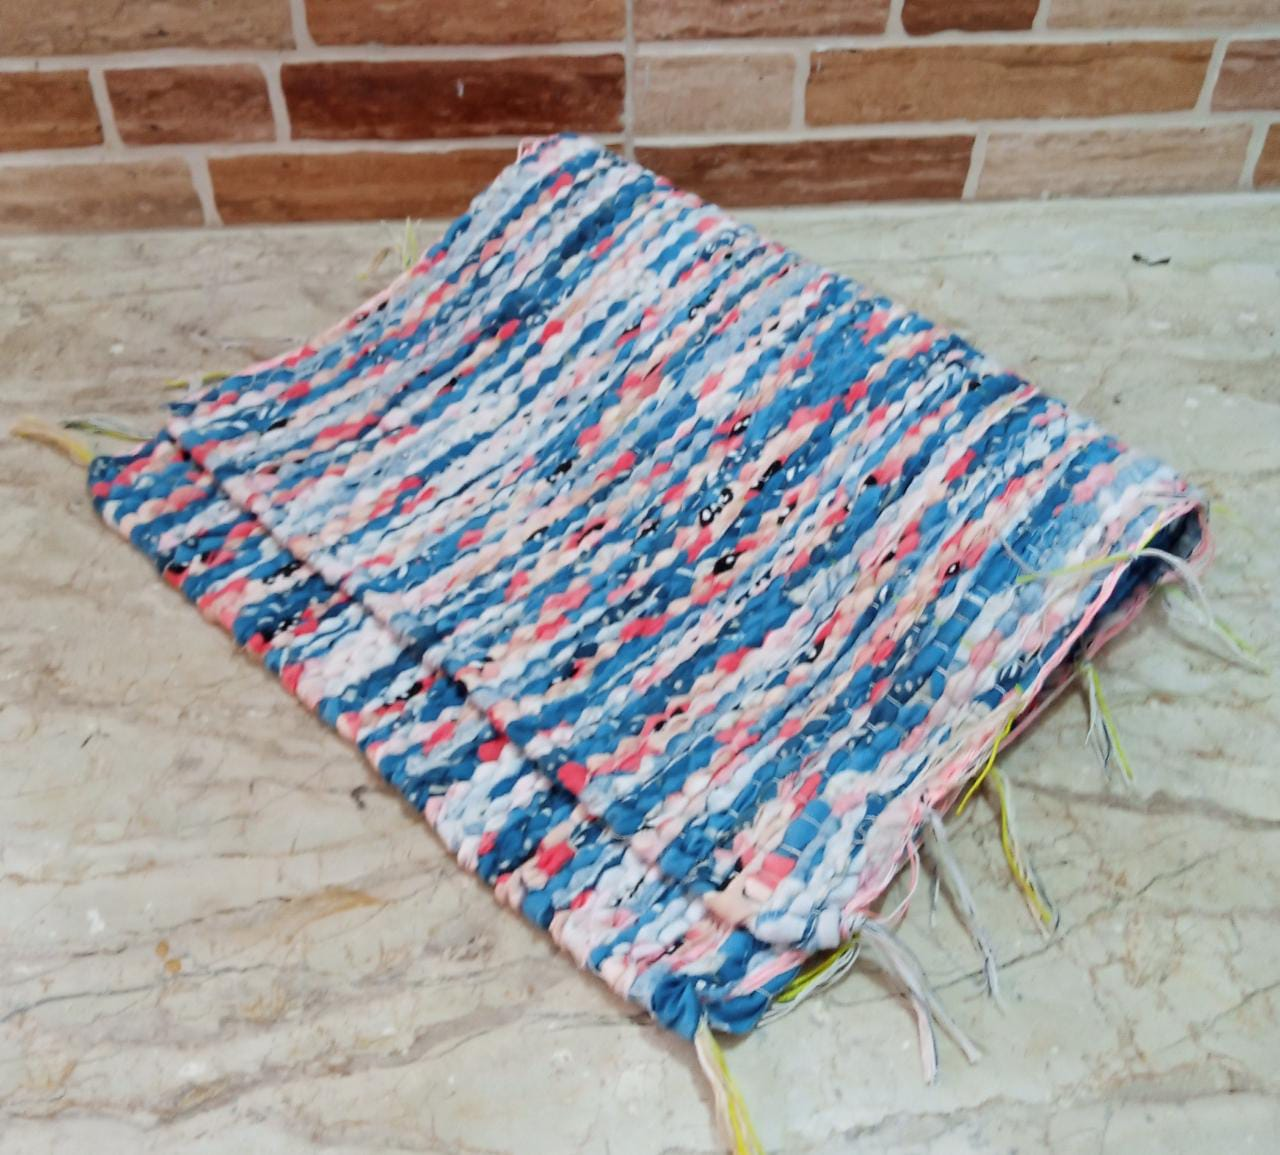 Hand Woven Rug Mat With Tassels Throw Rugs 20 X 30 Inch Door Mat, Indoor Area Rugs for Bathroom Bedroom Living Room Laundry Room